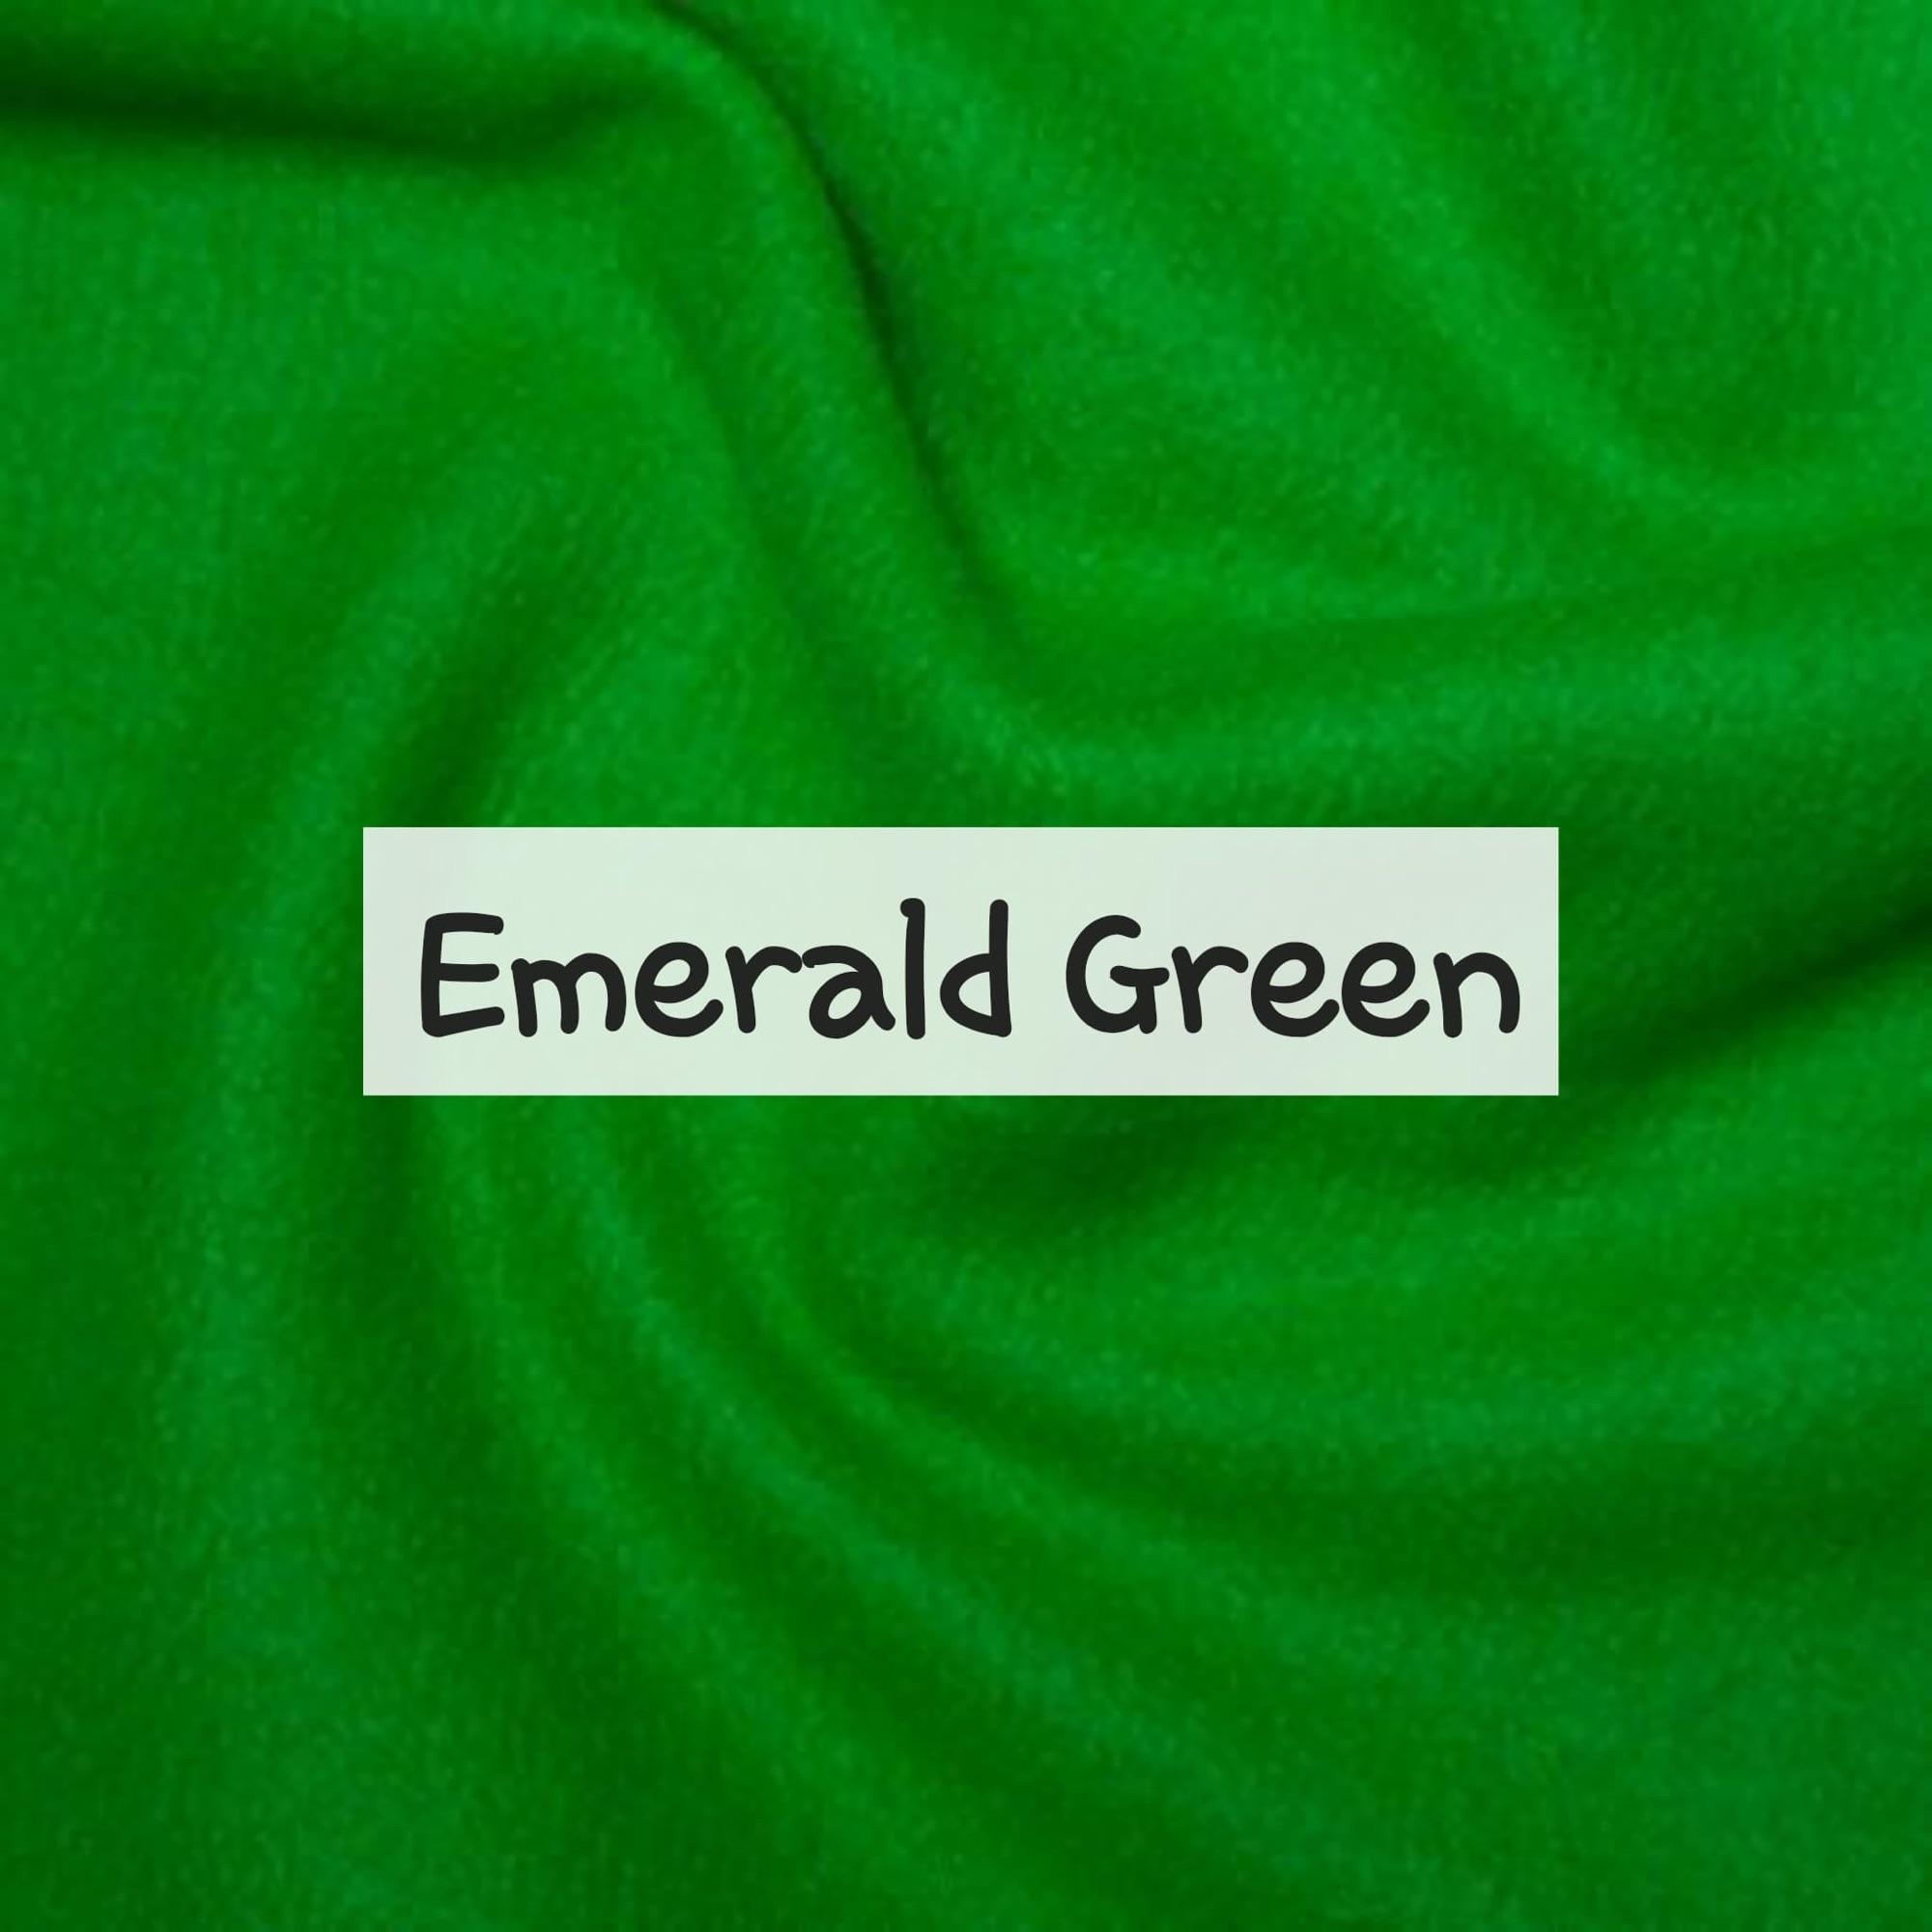 Emerald Green Fleece